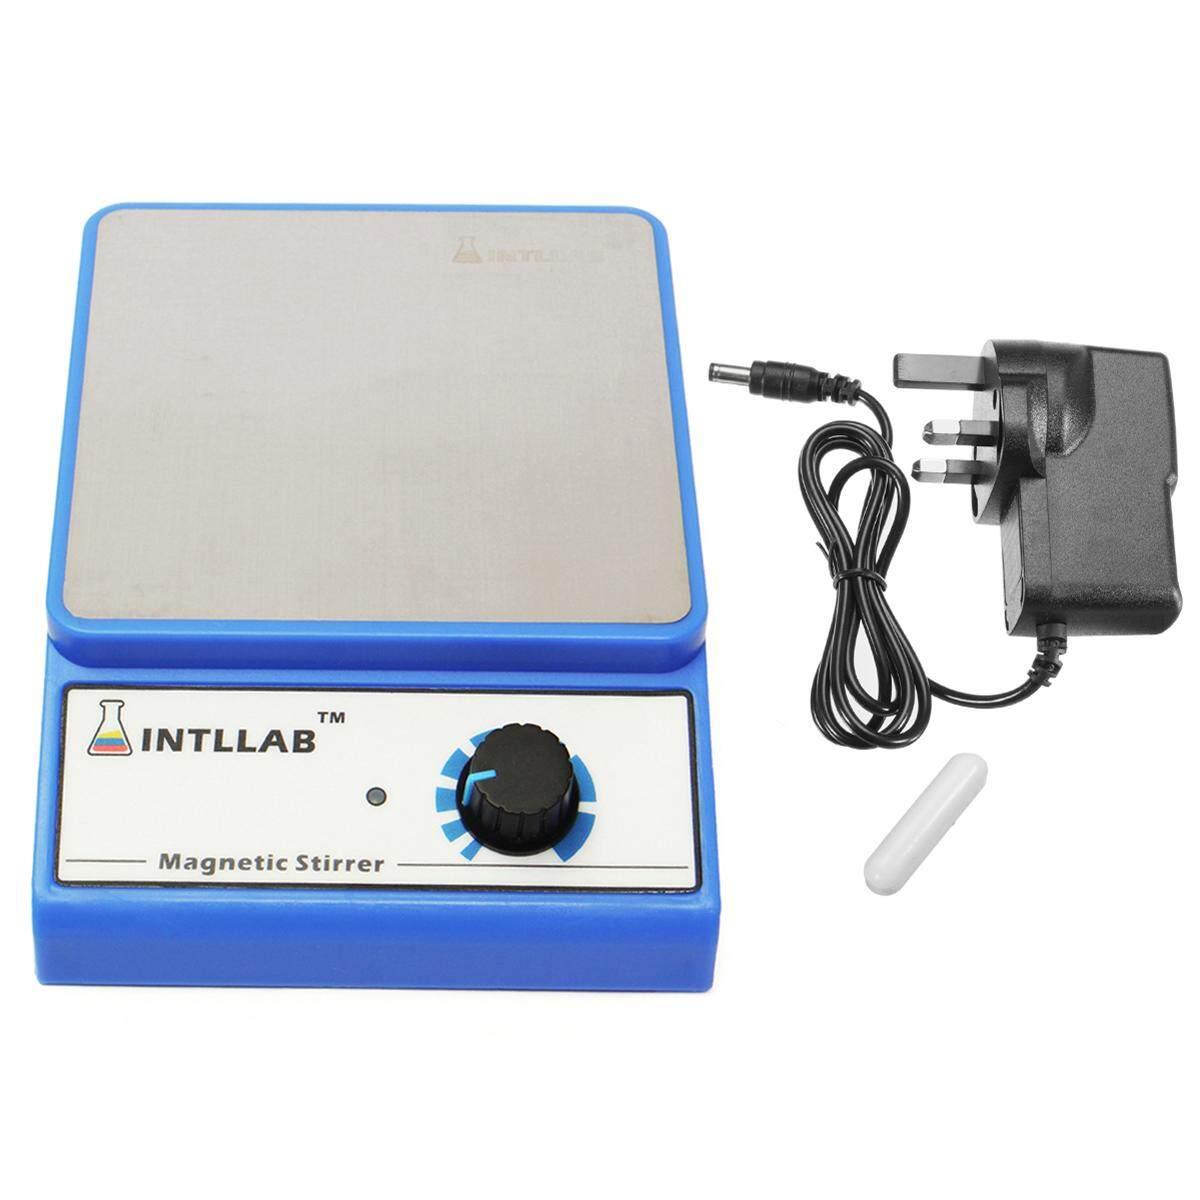 Magnetic Stirrer Home Laboratory Lab Mixer W/3000rpm AC 100-240V EU/US Plug [UK PLUG] - intl